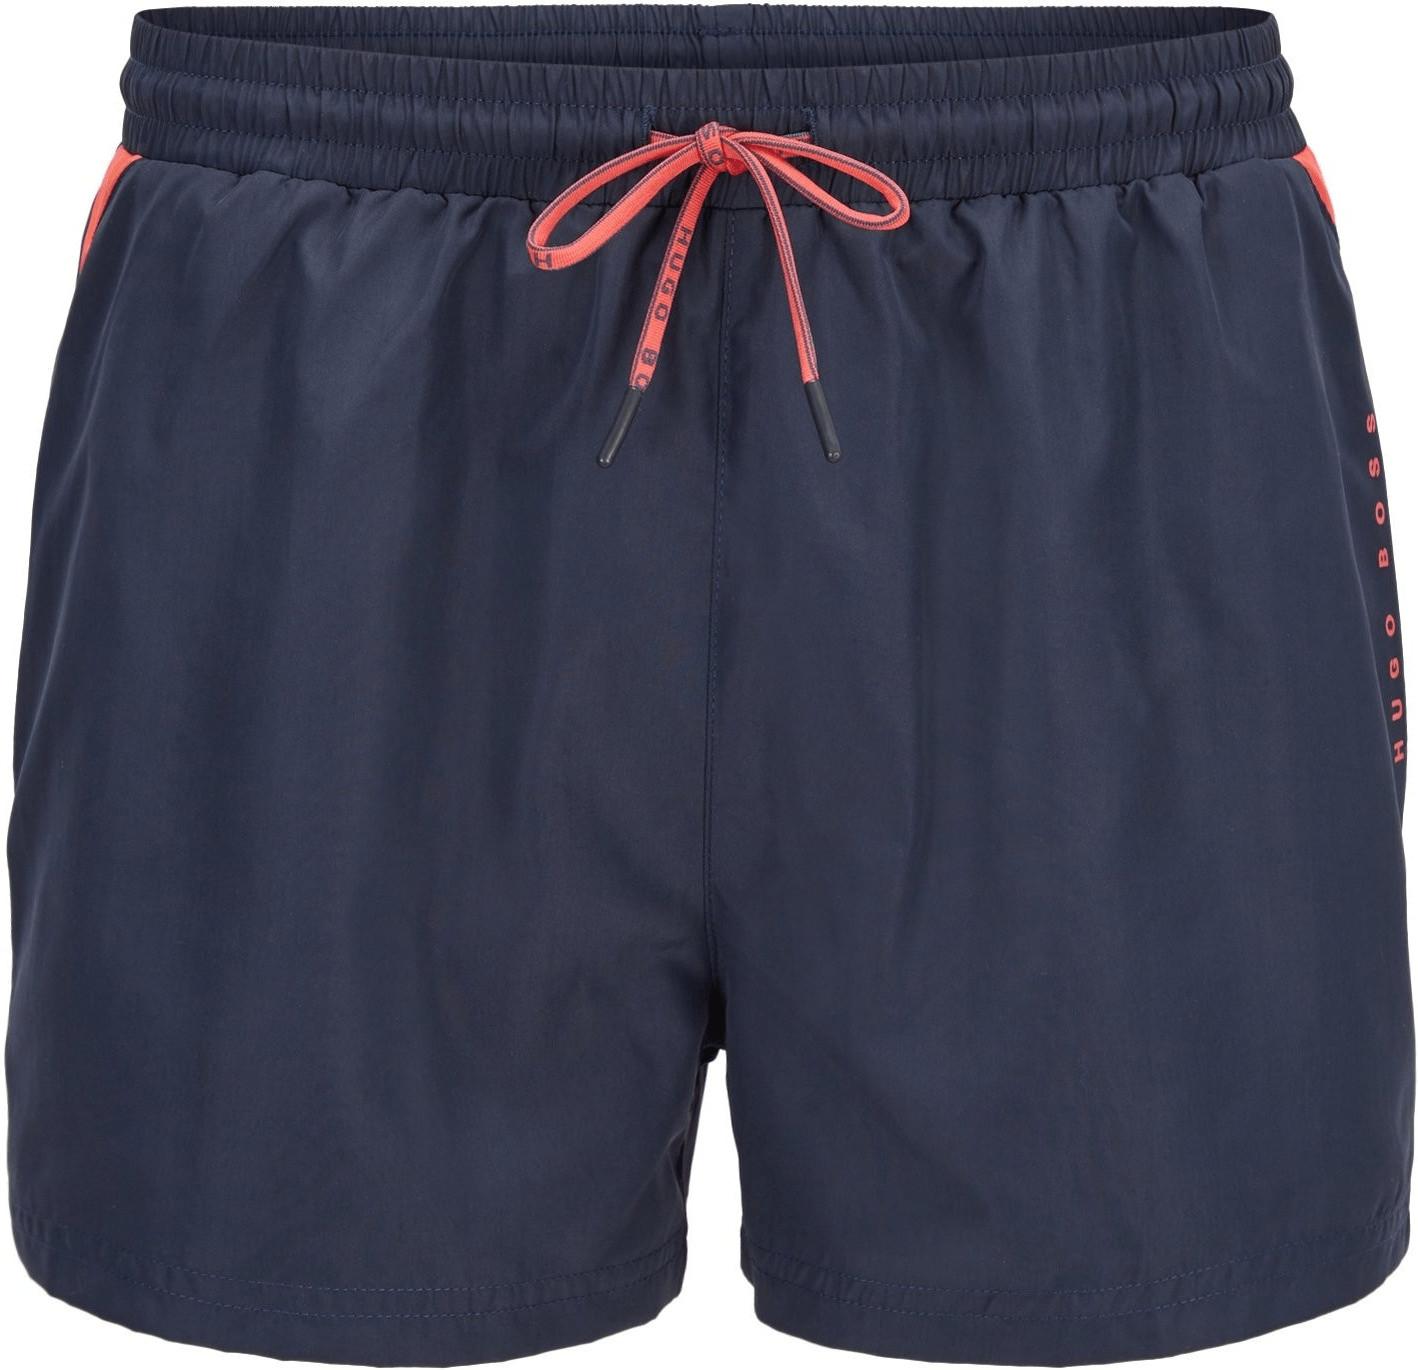 Hugo Boss Mooneye Swim Shorts light grey (50385398-063)